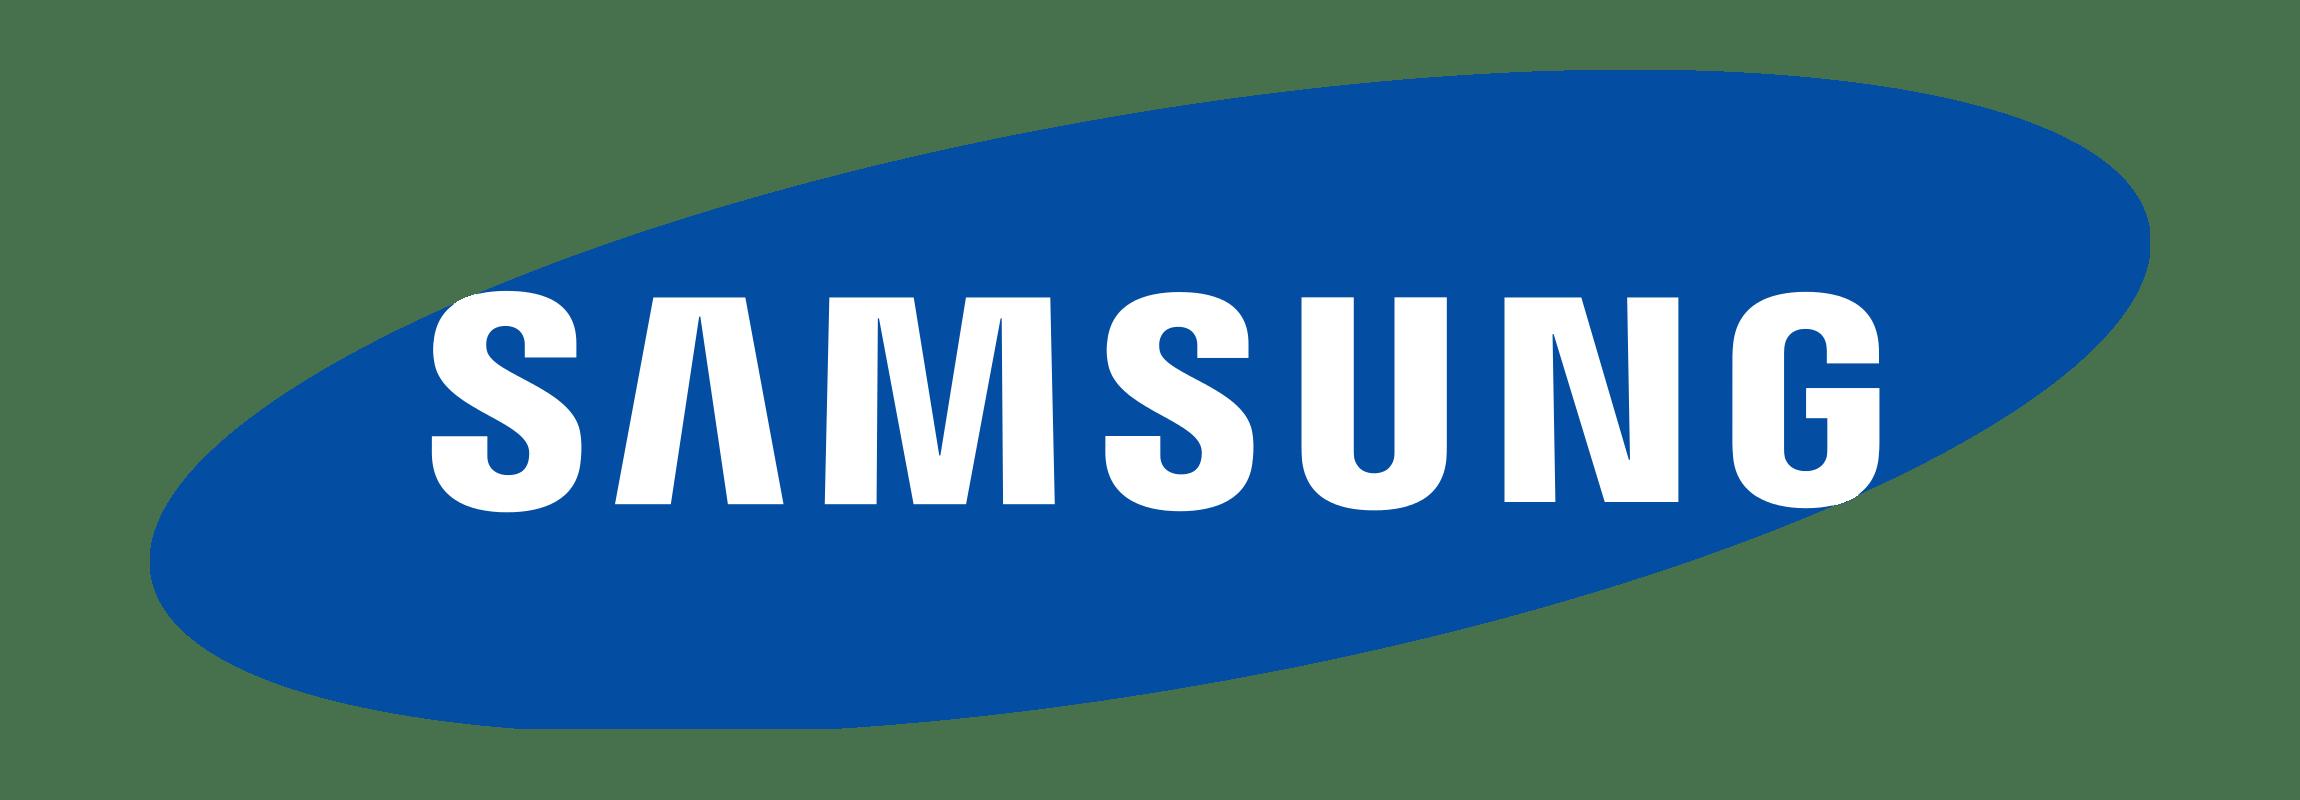 Samsung Logo Samsung Symbol Meaning History And Evolution